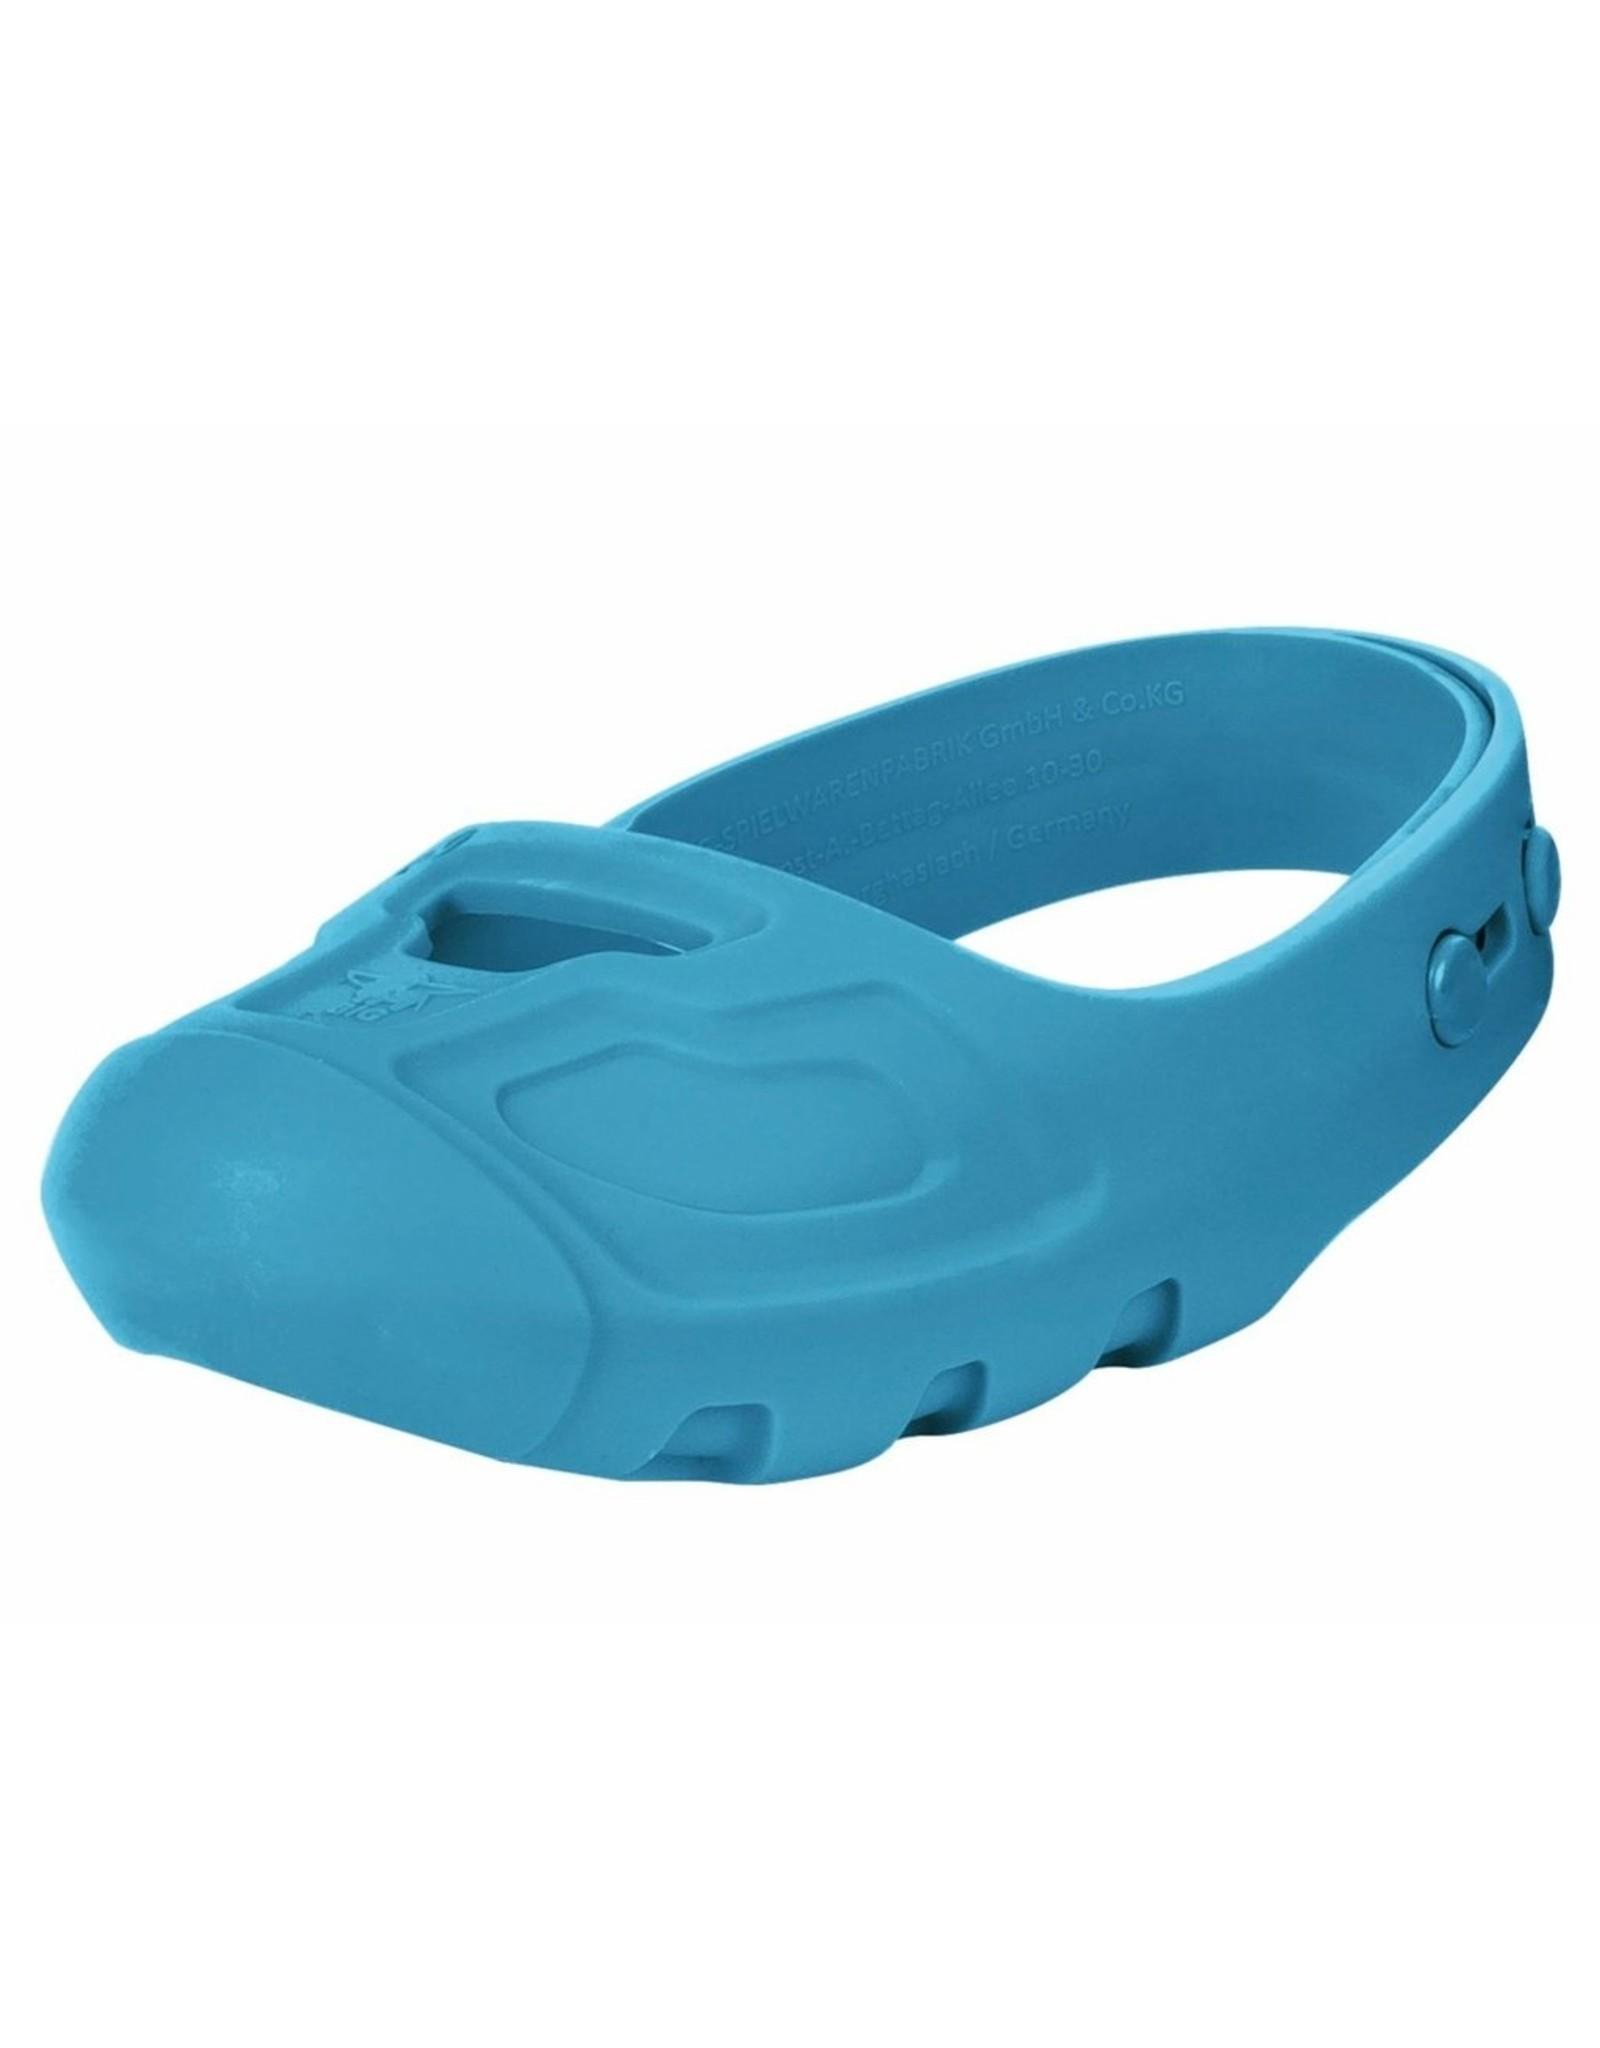 BIG BIG Shoe Care Blau